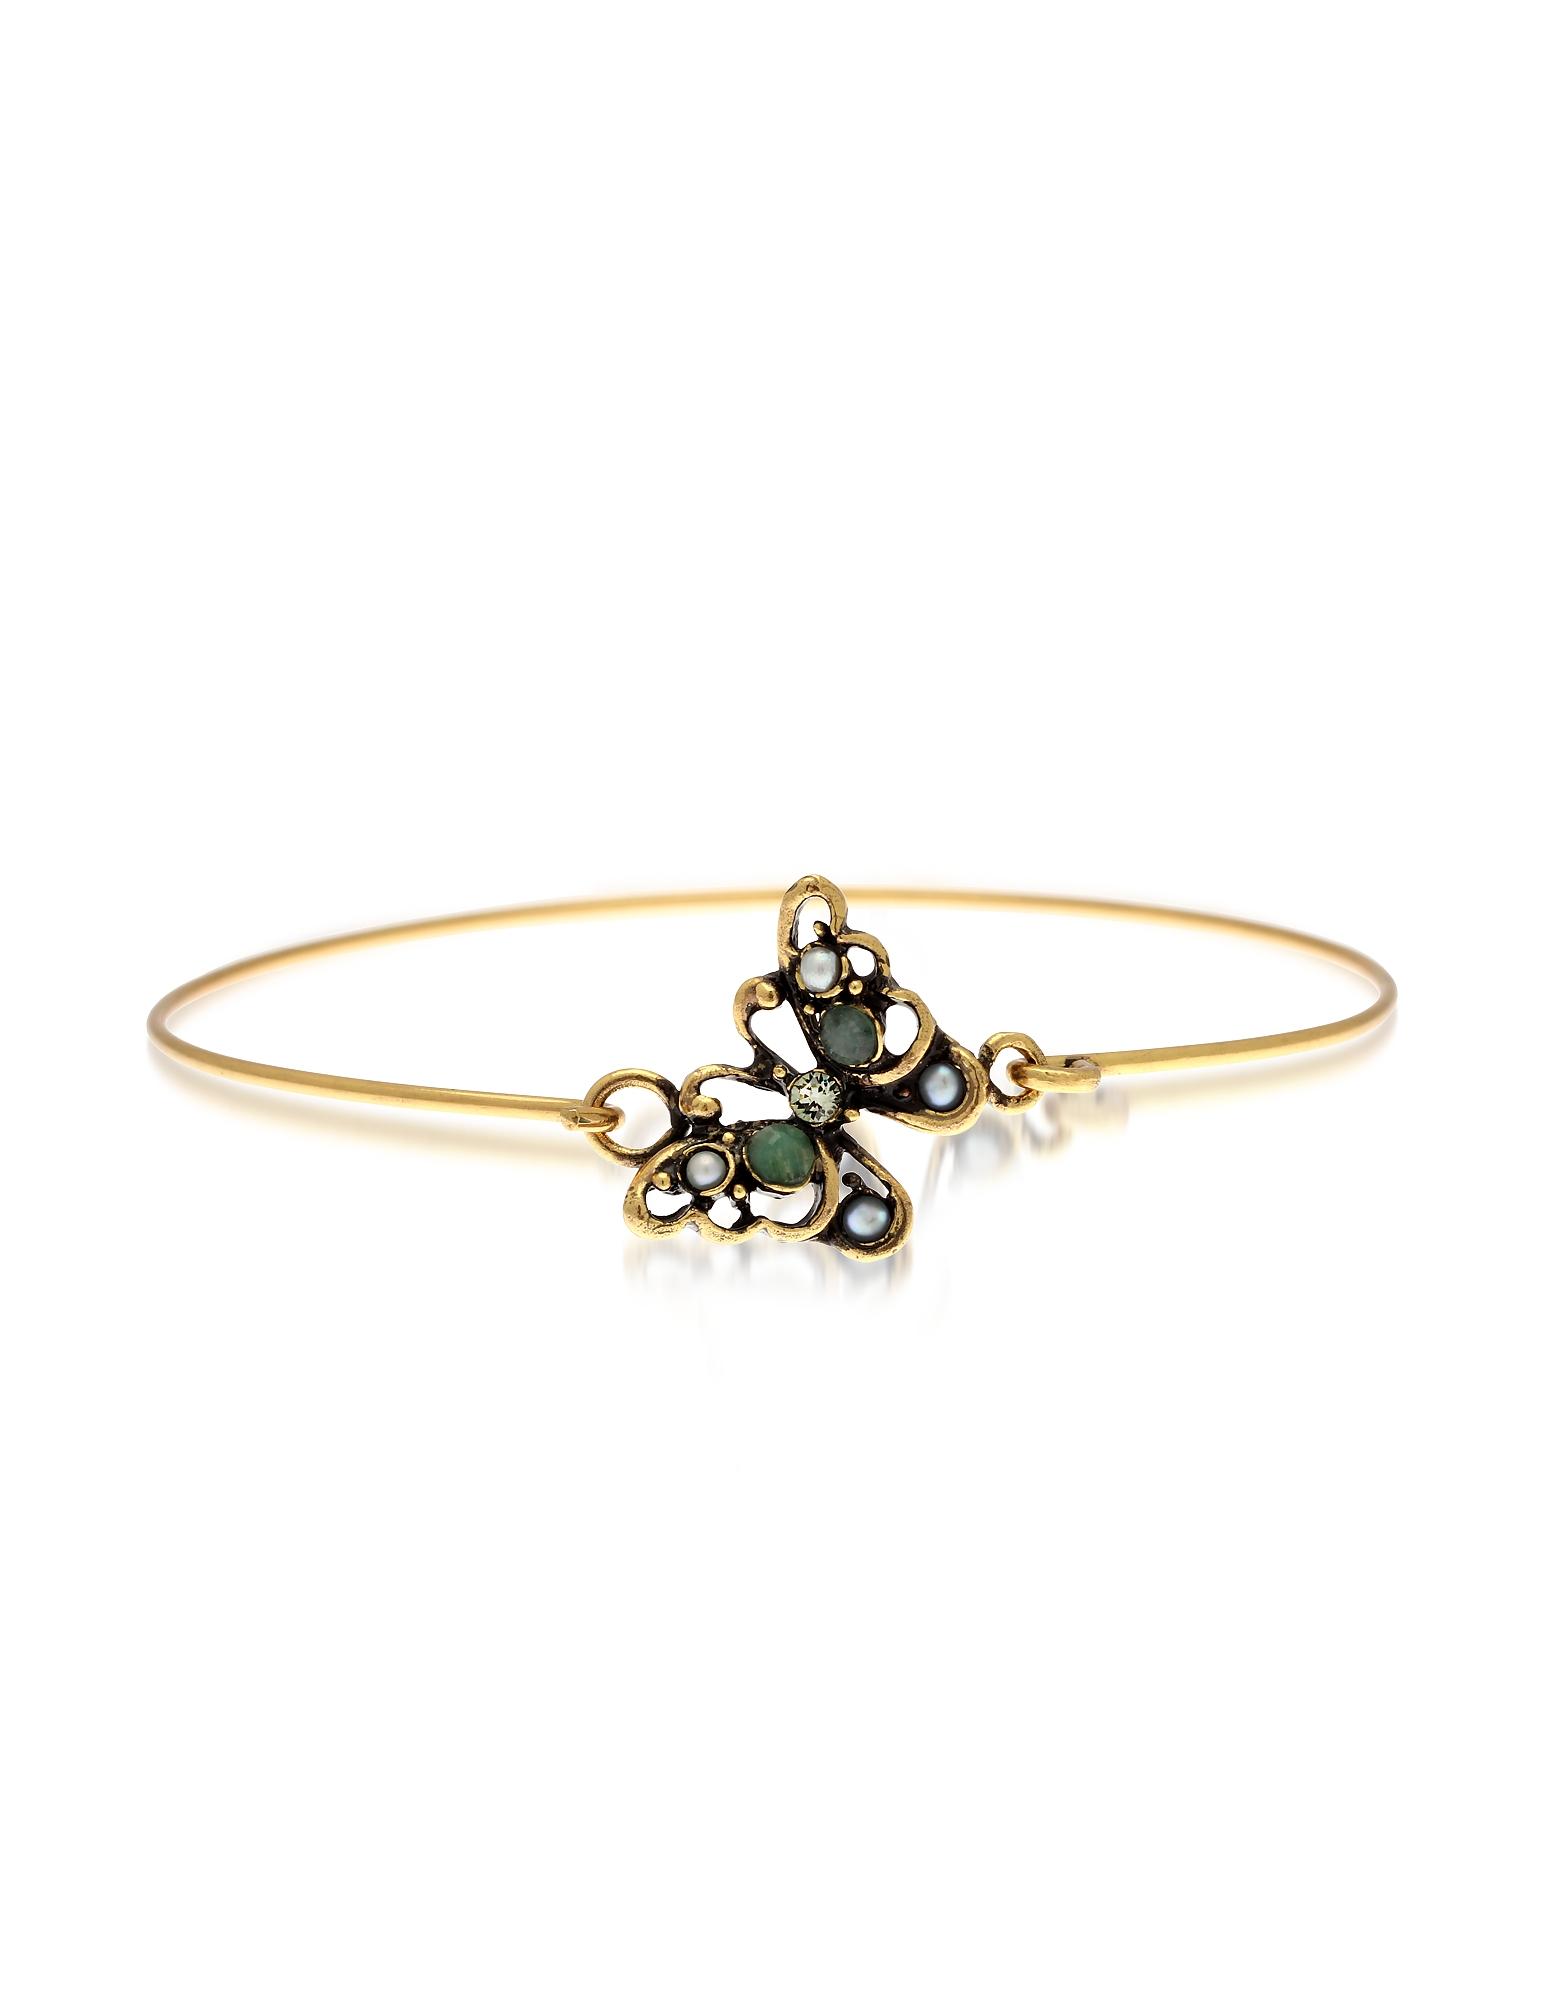 Forzieri coupon: Alcozer & J  Bracelets Butterfly Goldtone Brass Bangle w/Glass Pearls